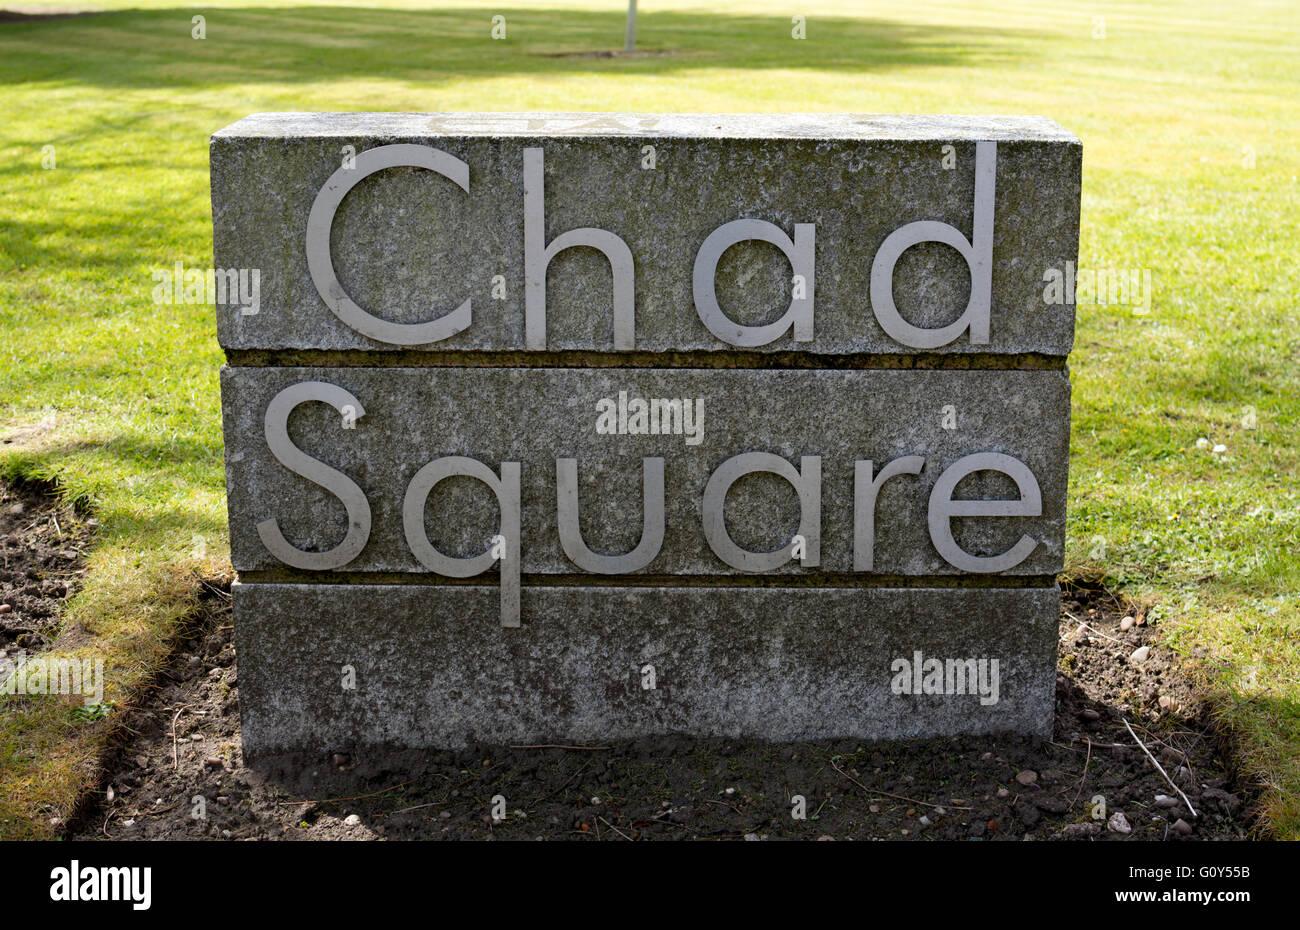 Chad Square sign, Chad Valley, Birmingham, UK Stock Photo